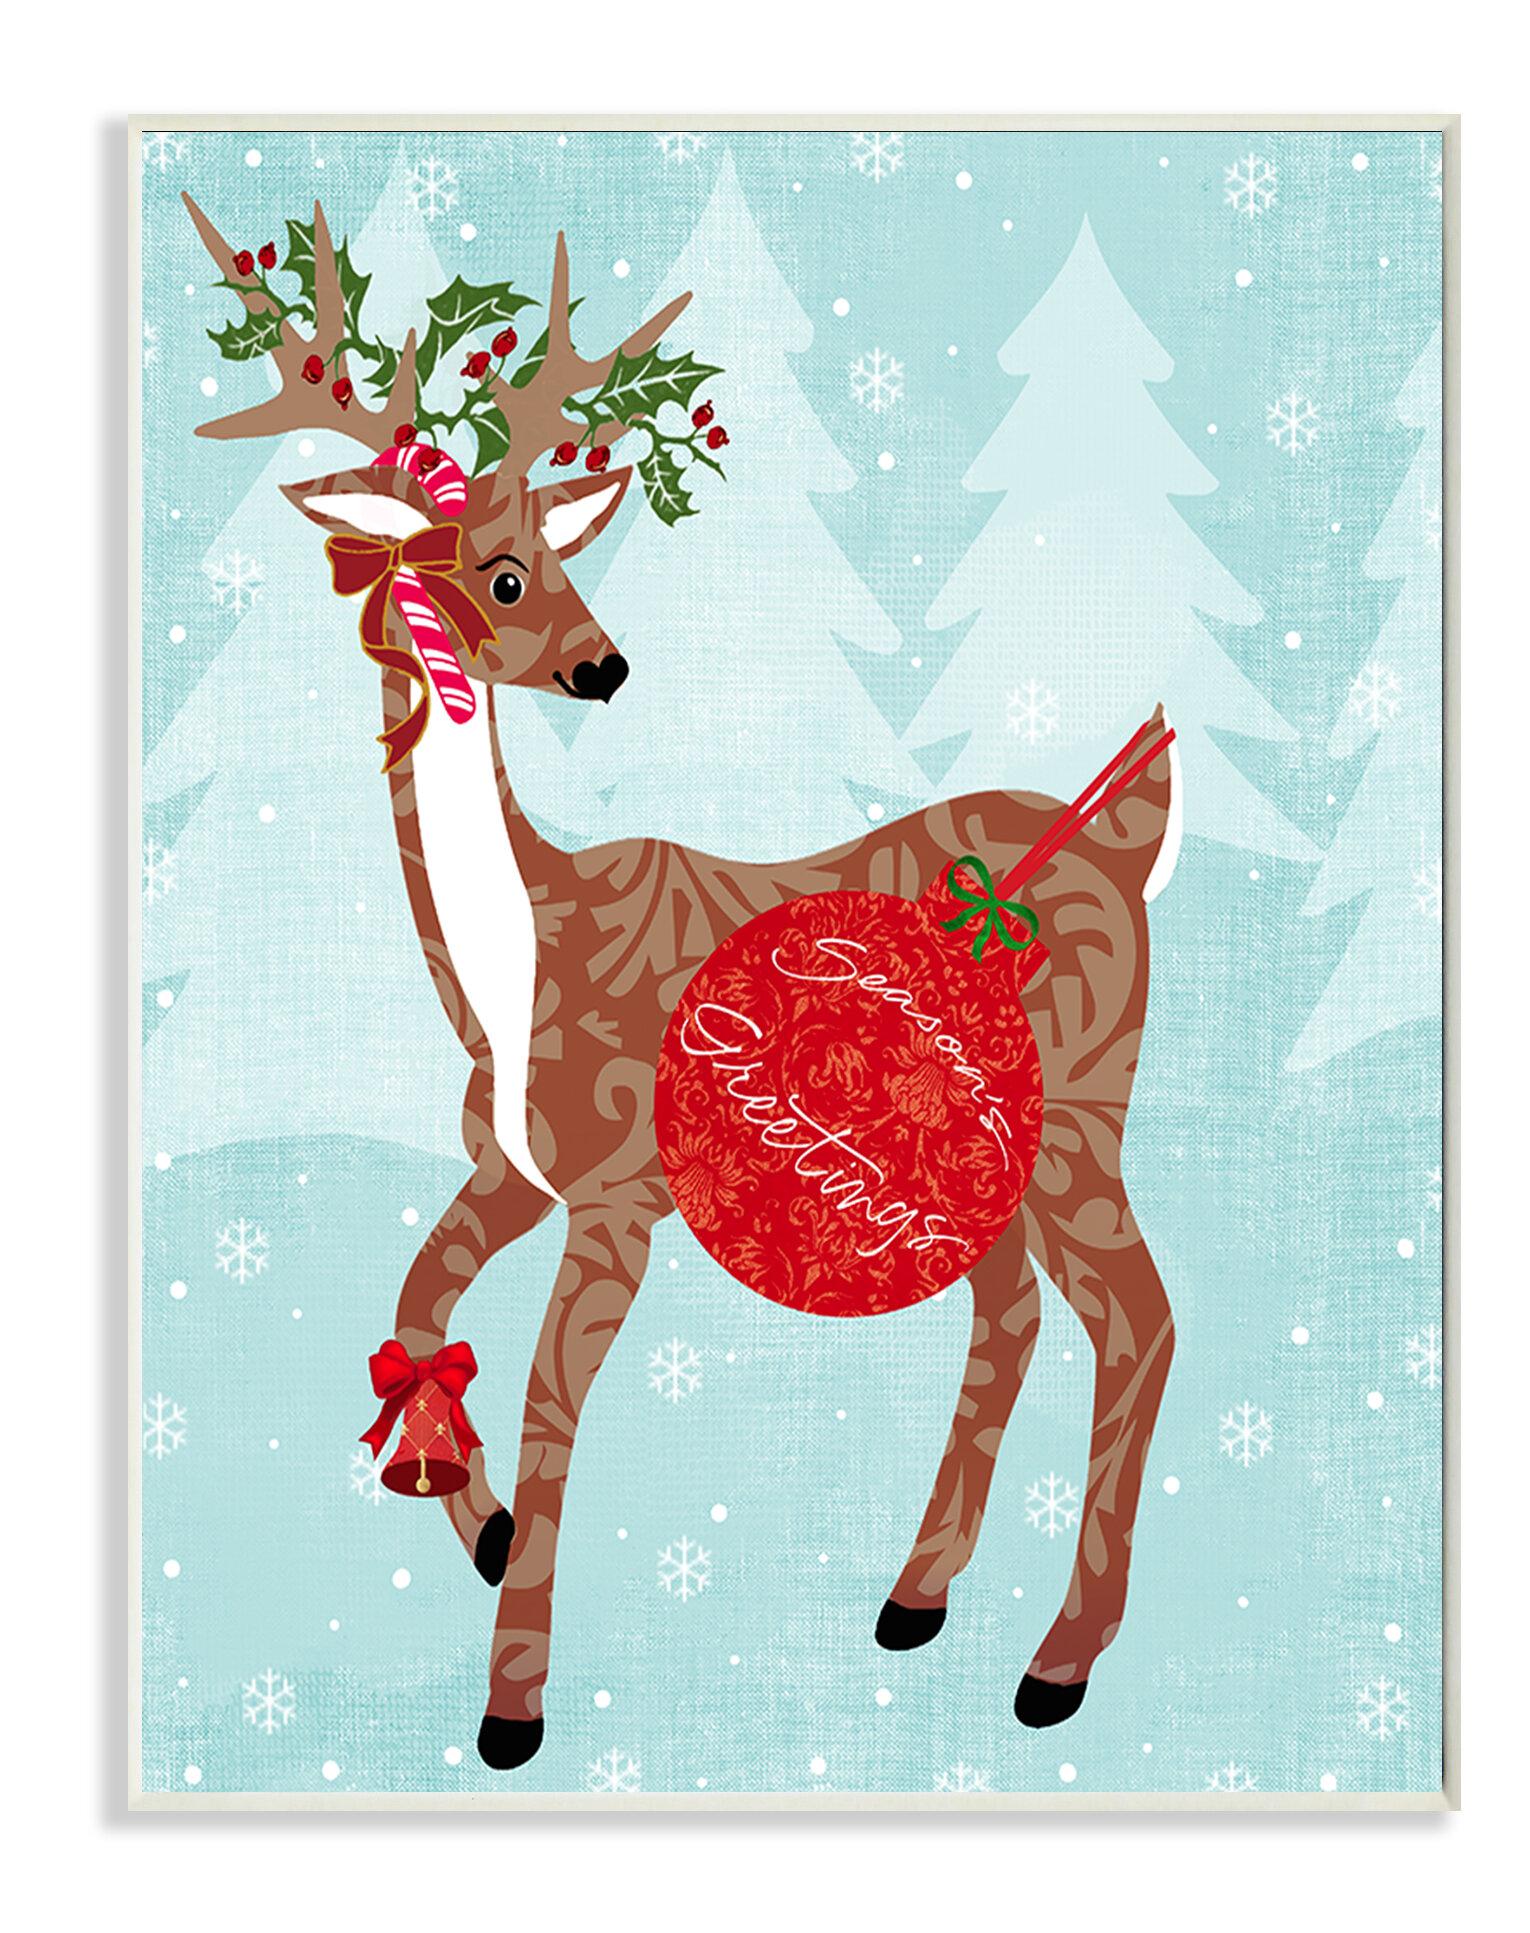 Stupell Industries Seasons Greetings With Reindeer Graphic Art